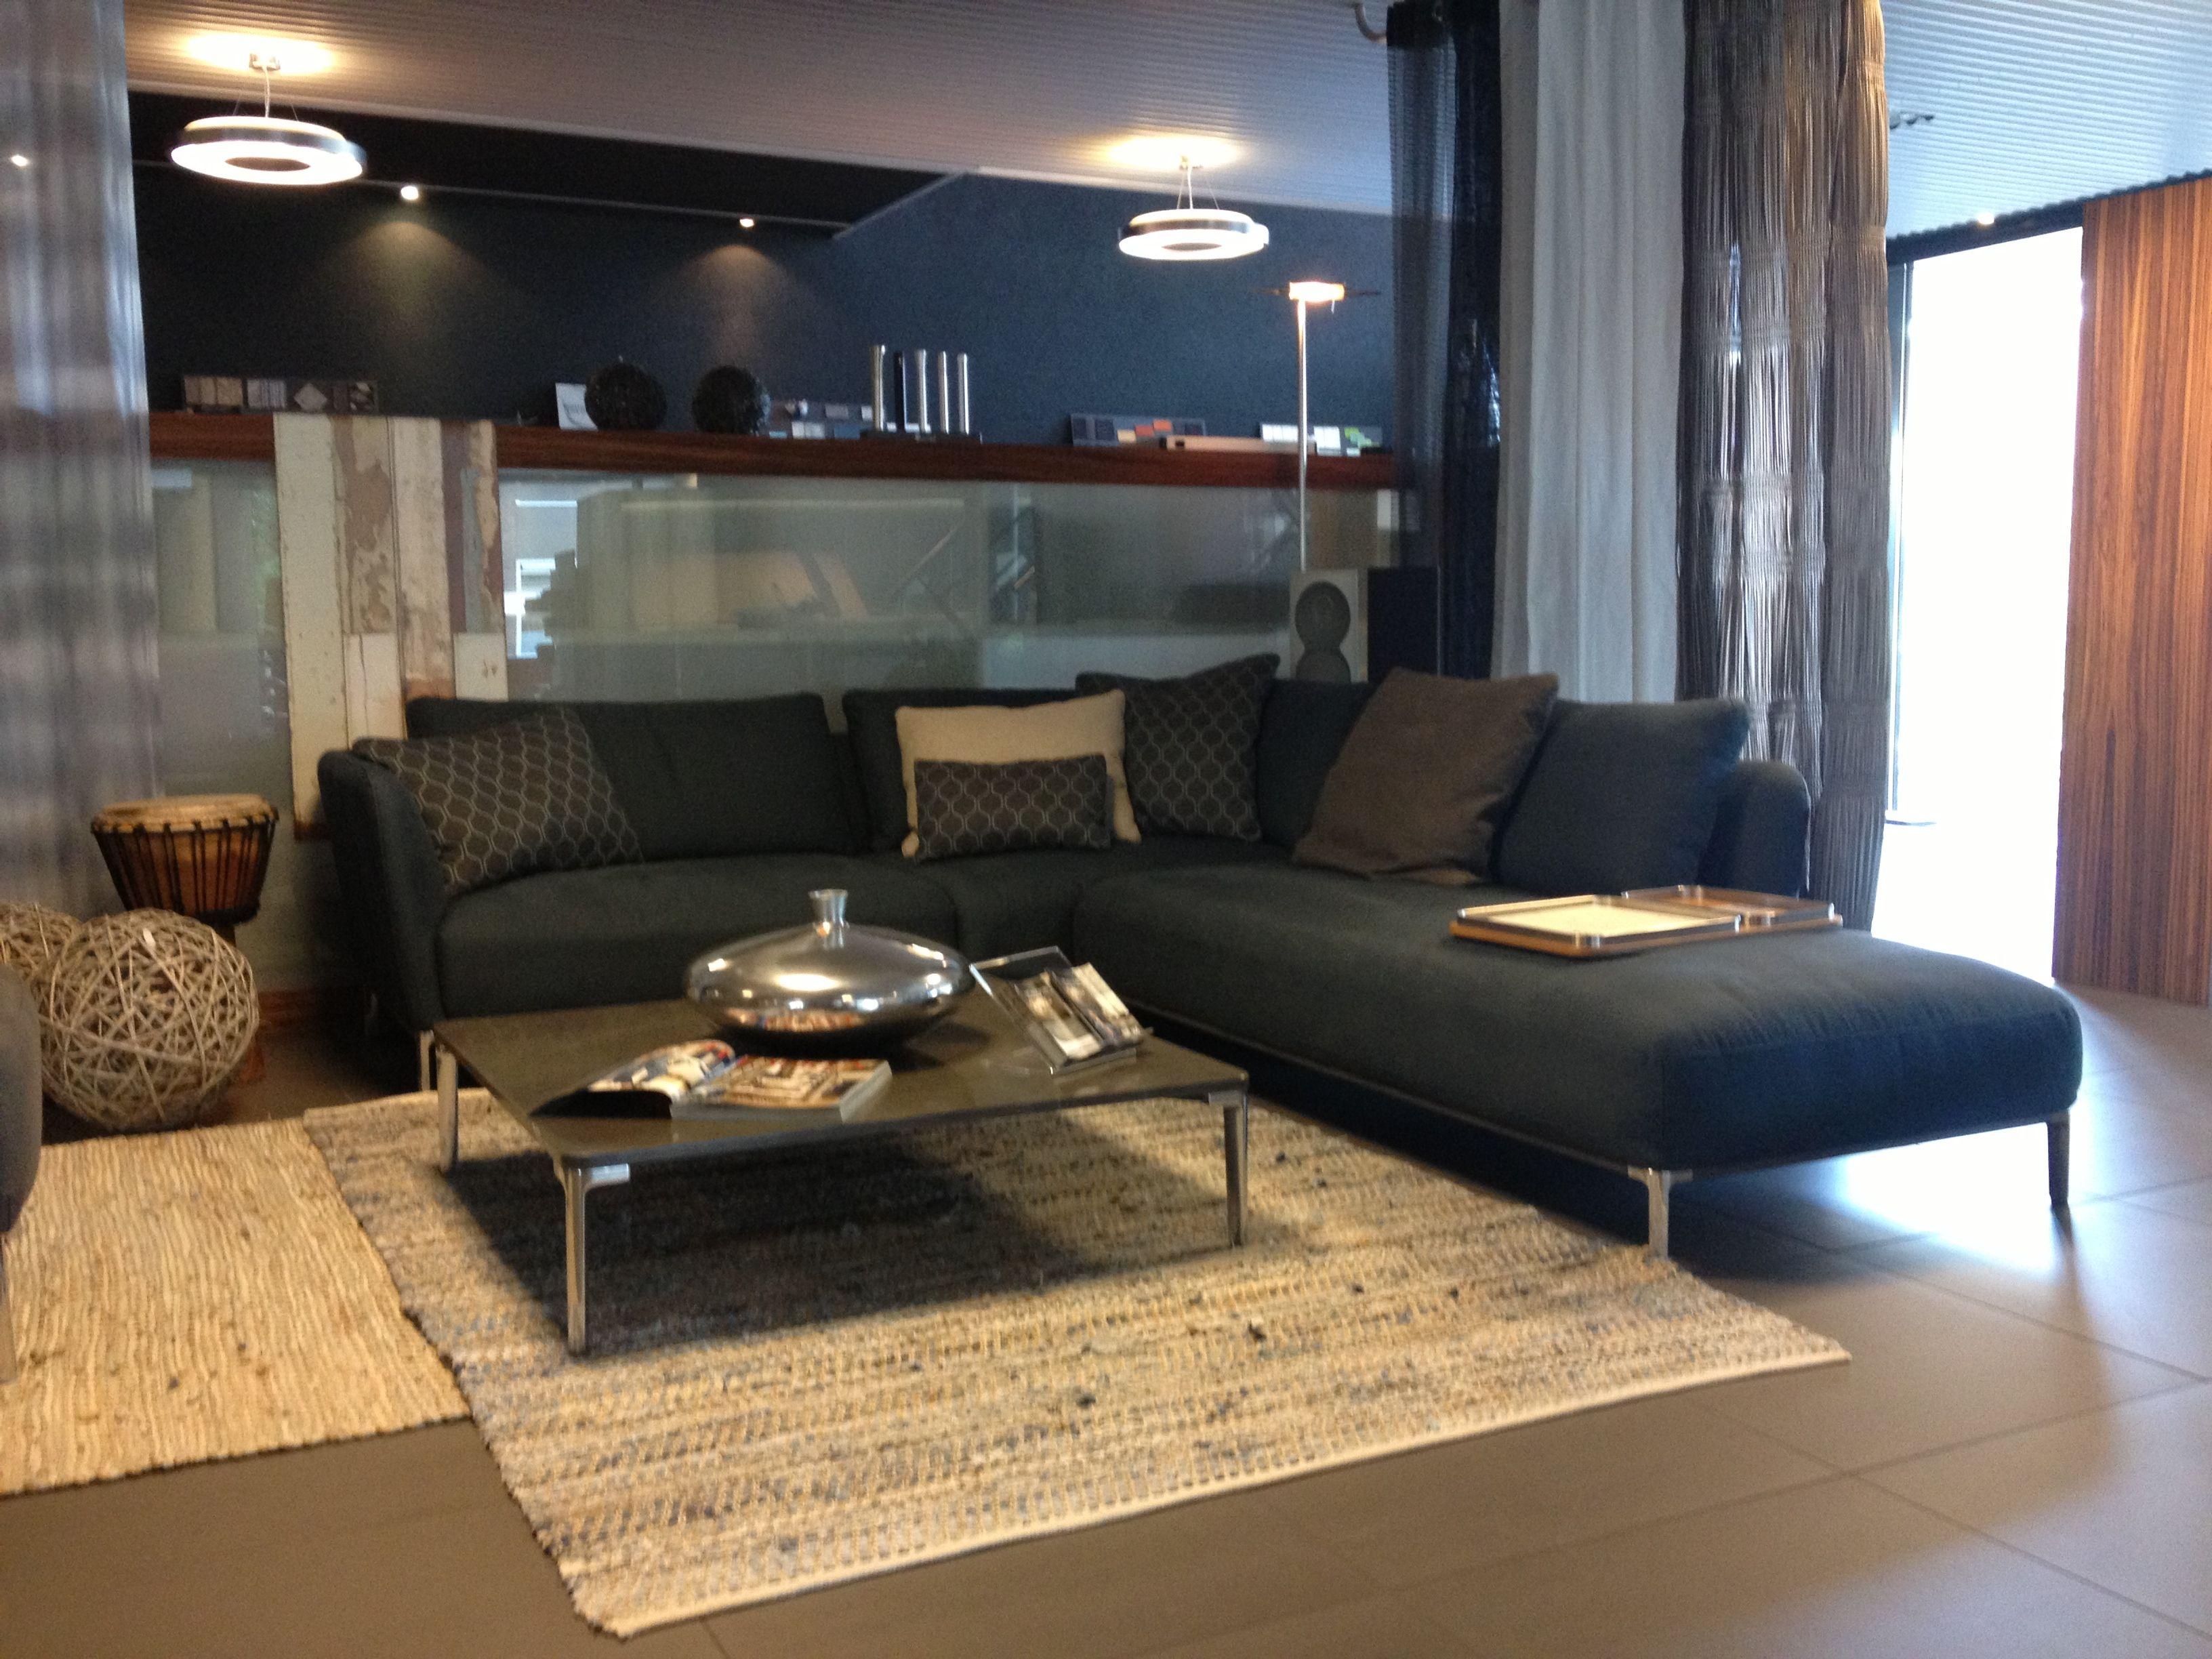 rolf benz scala jacco meubelen pinterest. Black Bedroom Furniture Sets. Home Design Ideas